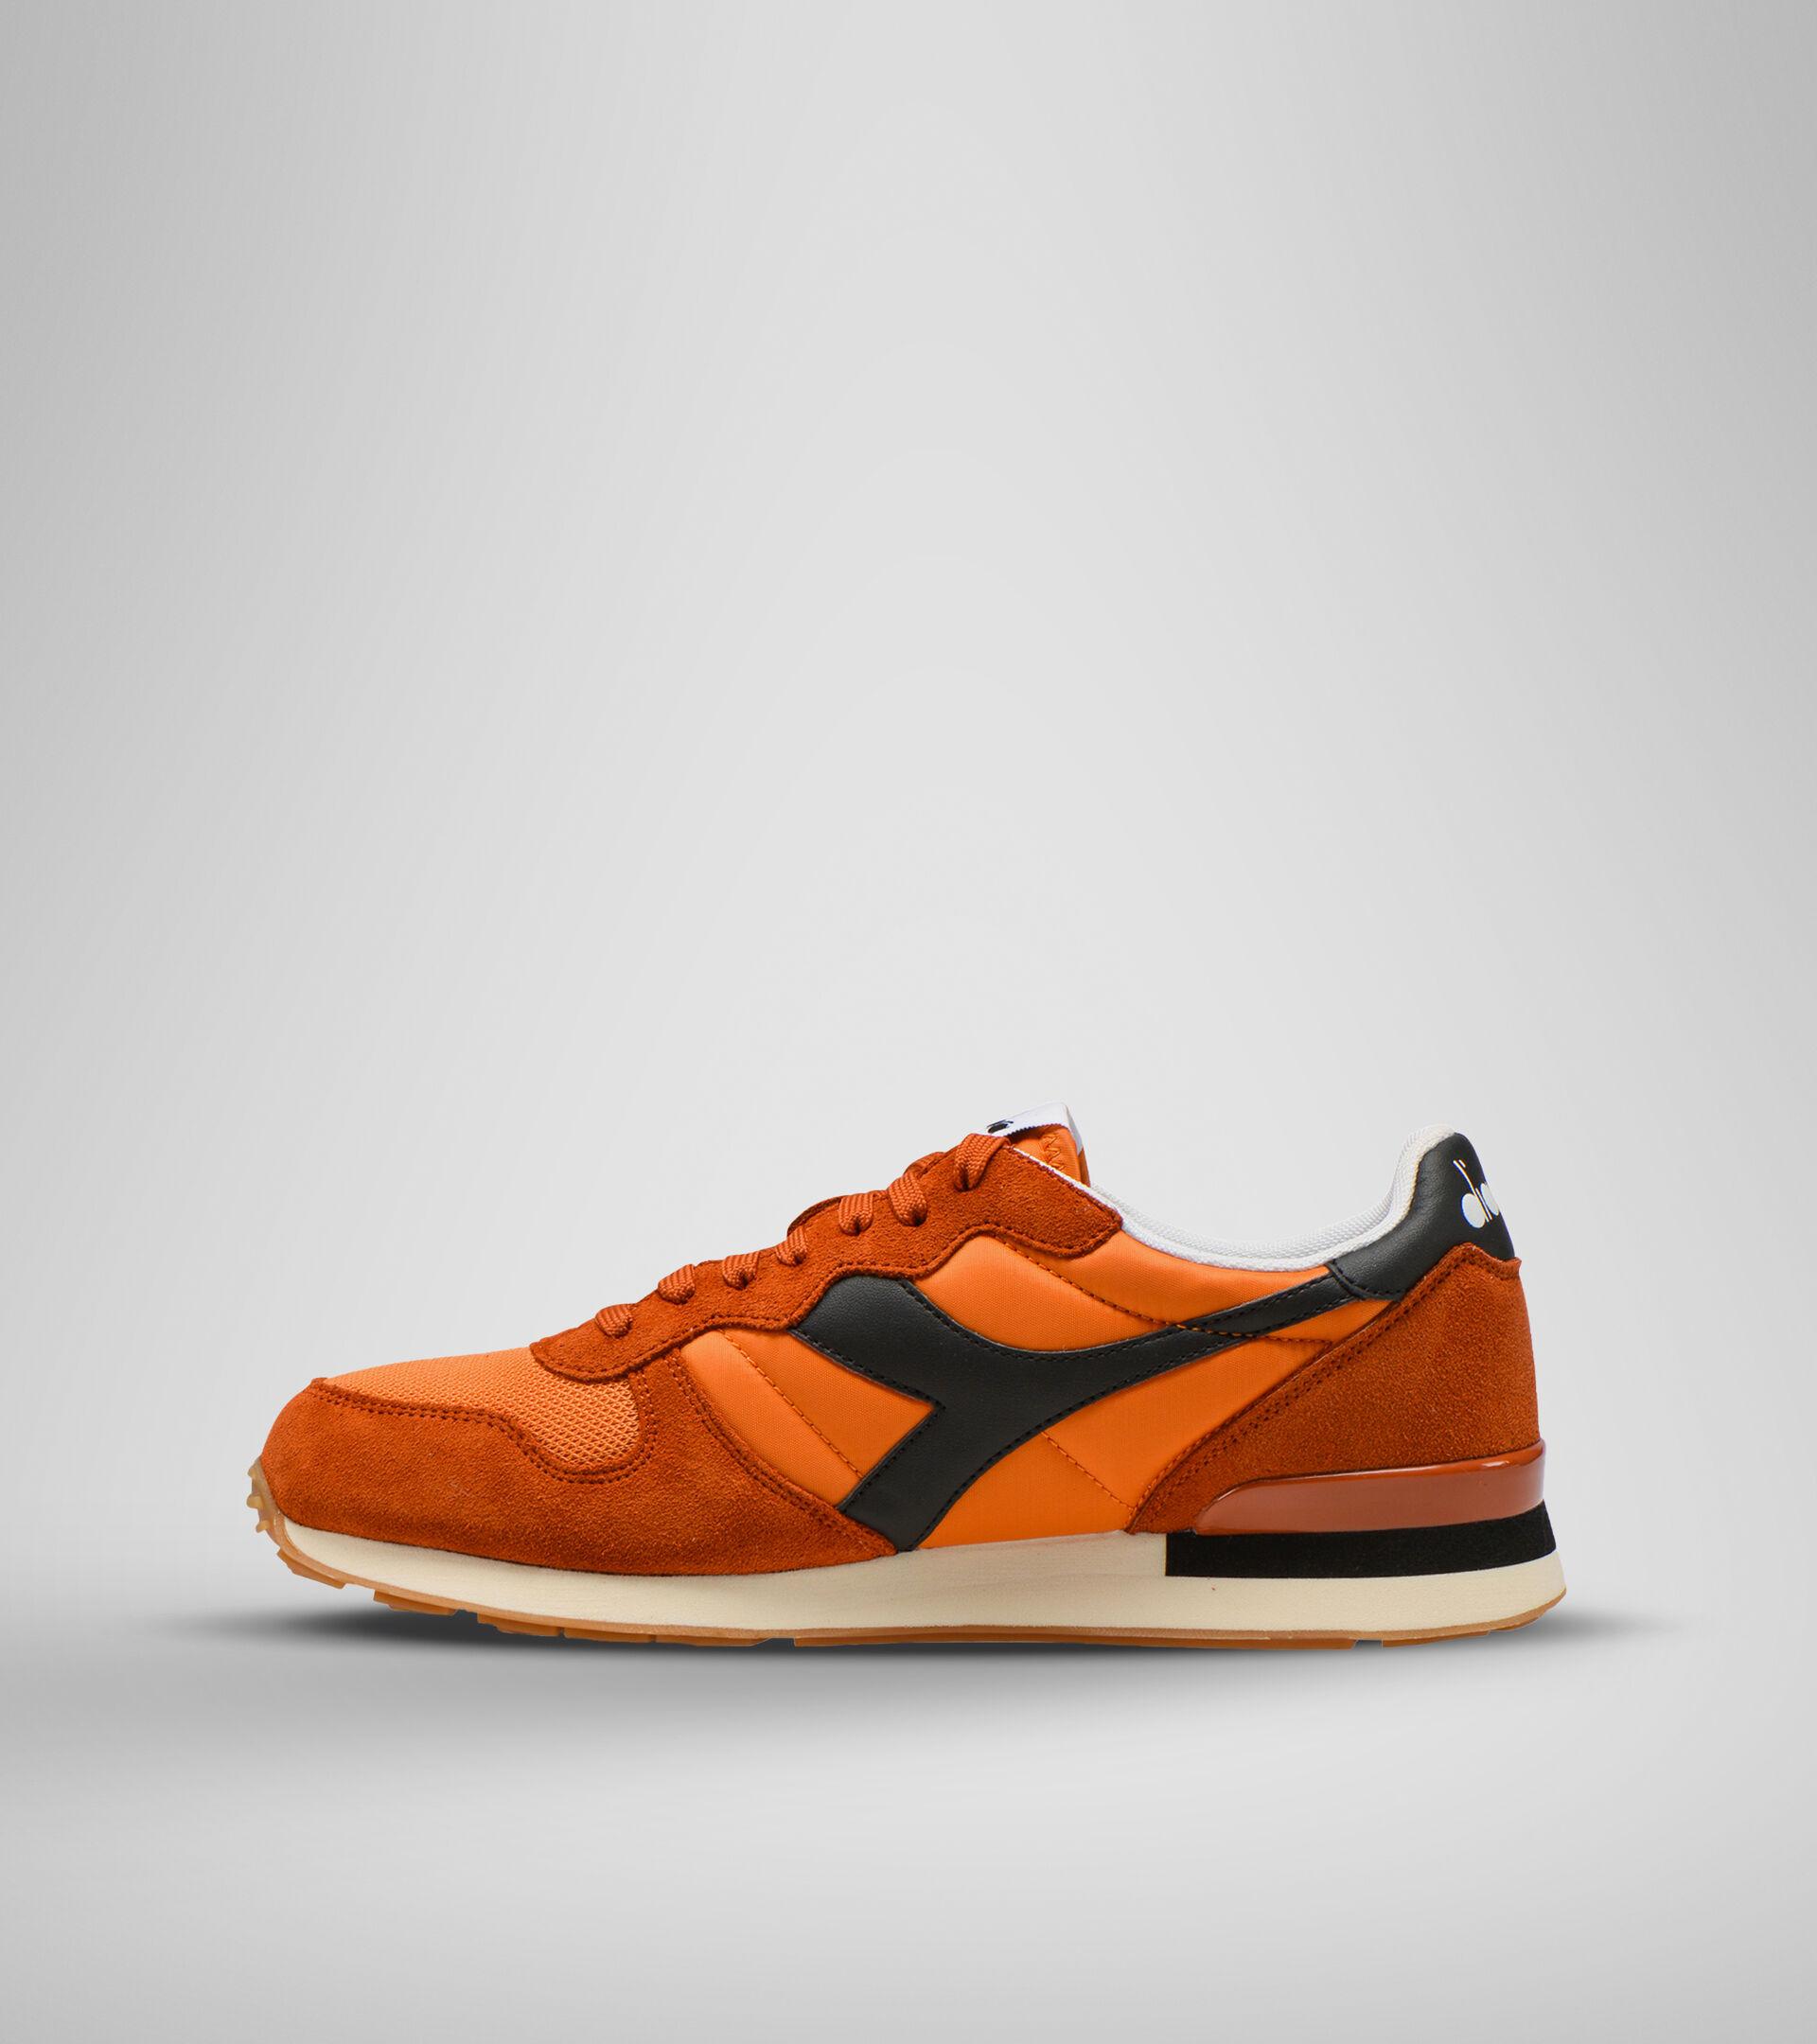 Footwear Sportswear UNISEX CAMARO GOLD FLAME/DESERT SUN/BLACK Diadora